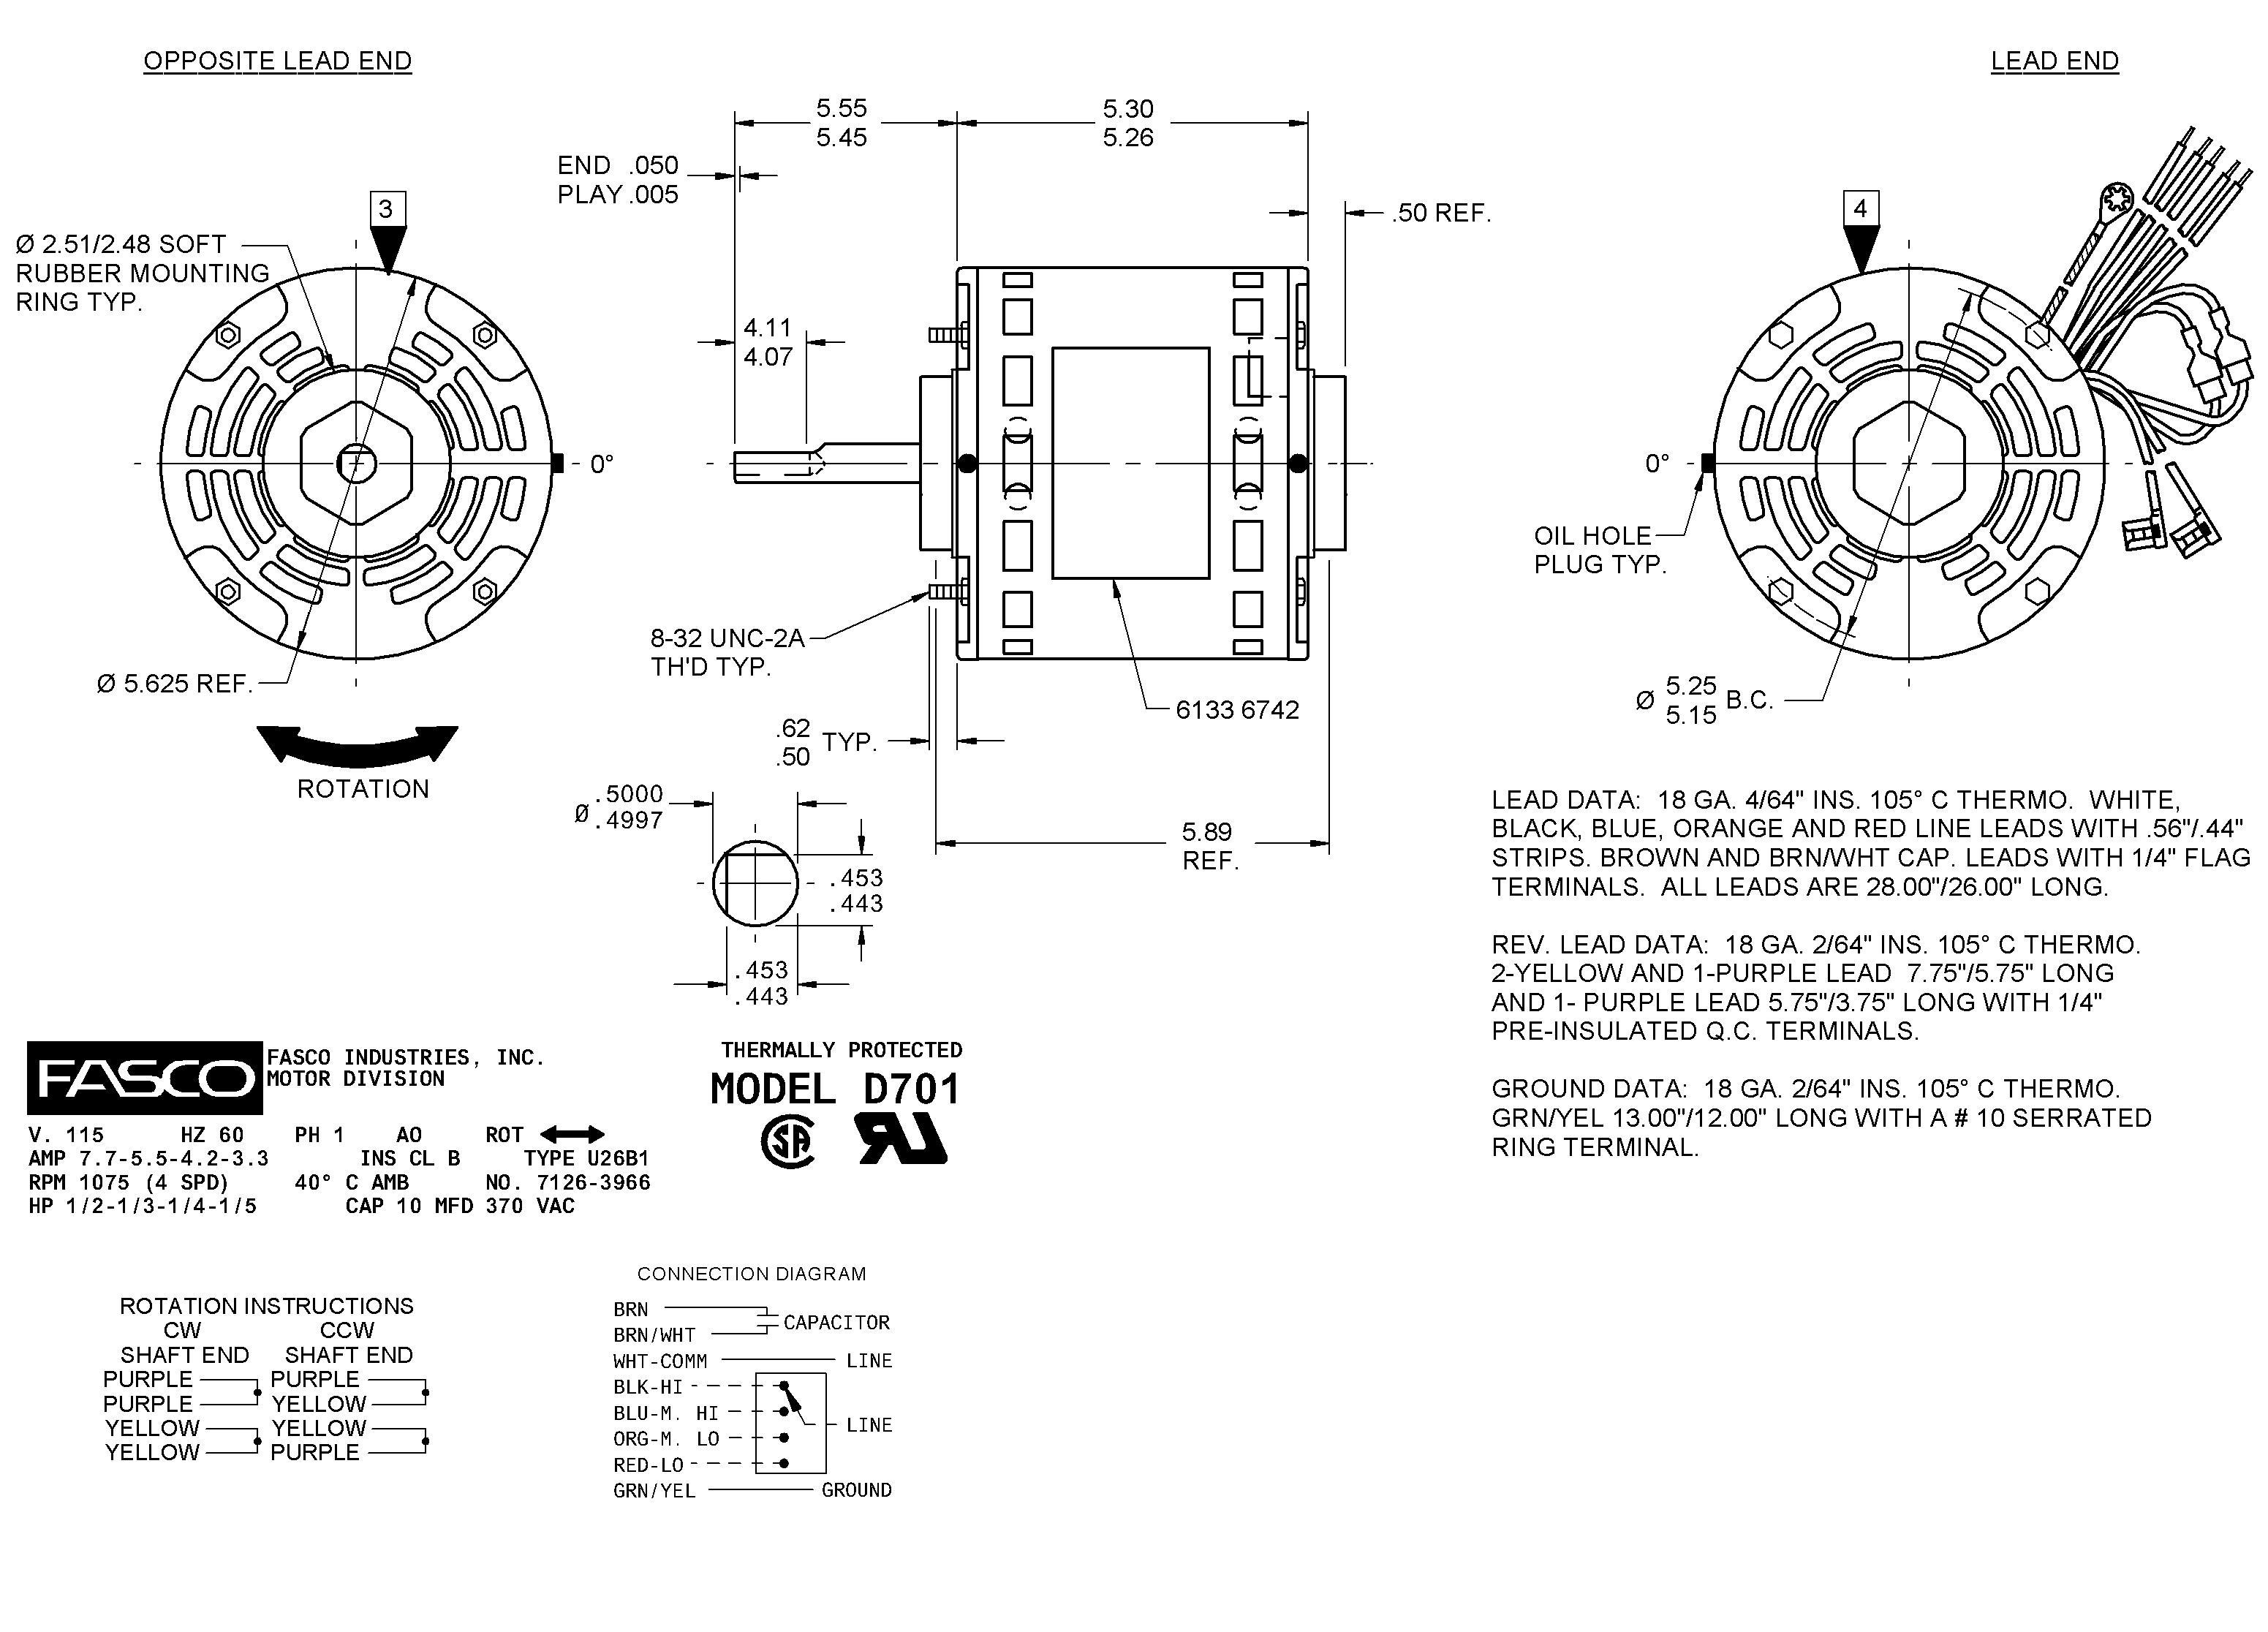 [SCHEMATICS_4CA]  MB_5858] Fasco Blower Motor Wiring Diagram Download Diagram | Fasco Furnace Motor Wiring Diagrams |  | Epsy Unde Caba Pap Mohammedshrine Librar Wiring 101